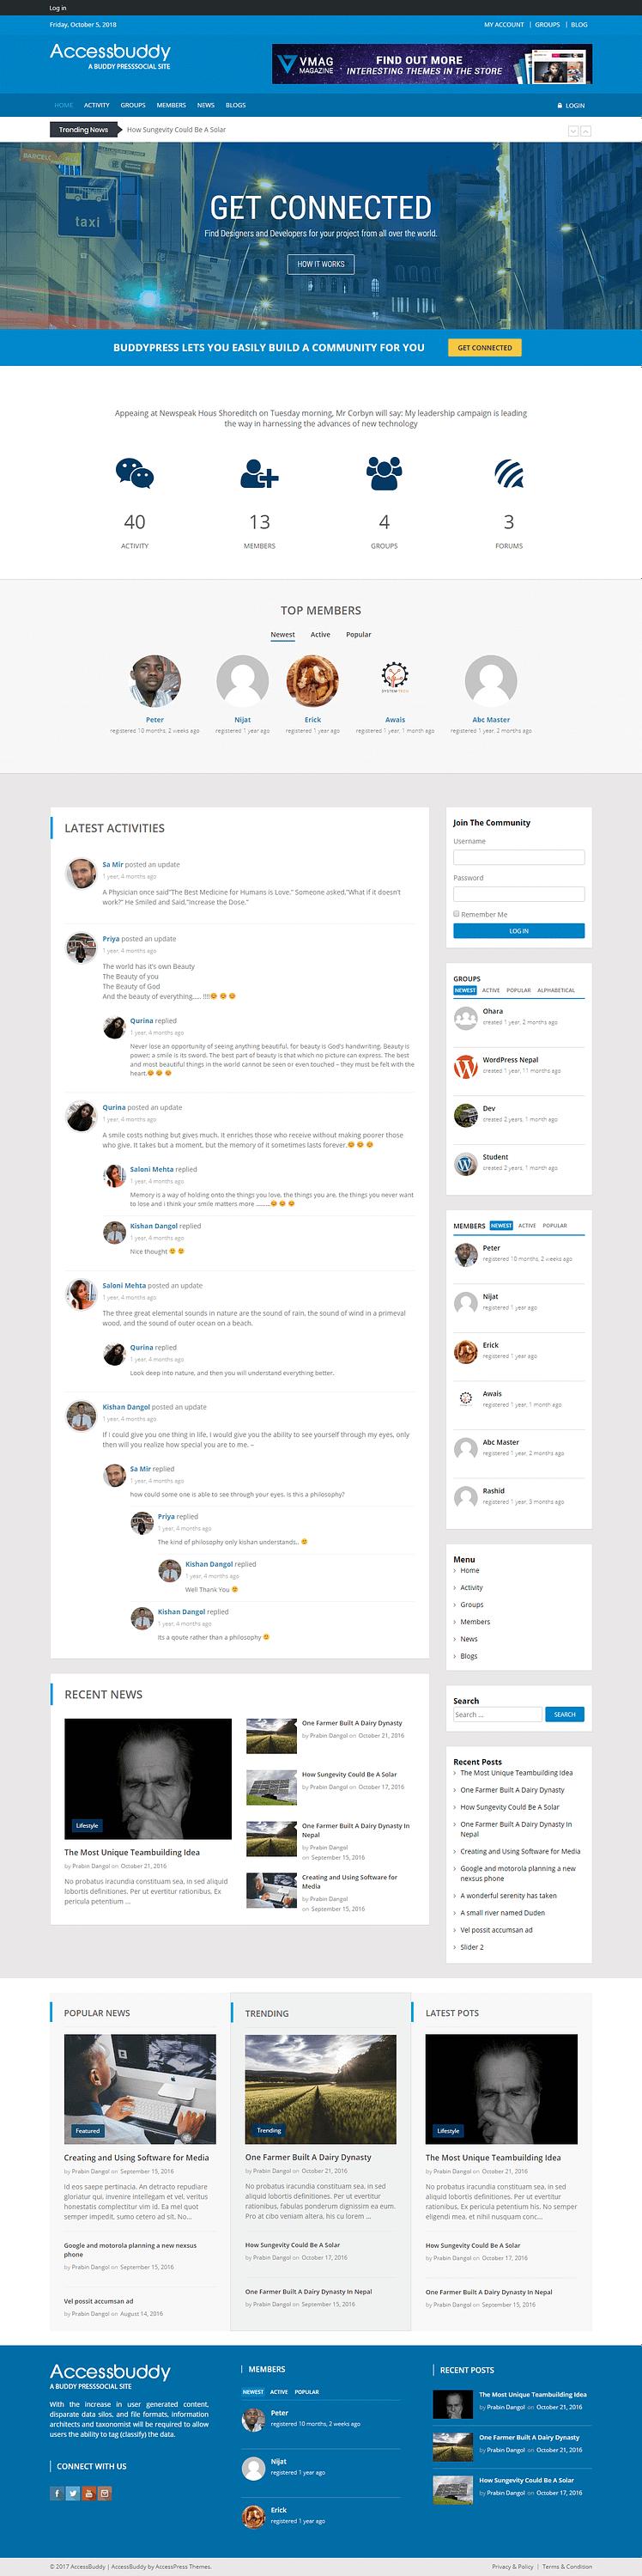 AccessBuddy - Best Free Multipurpose WordPress Theme